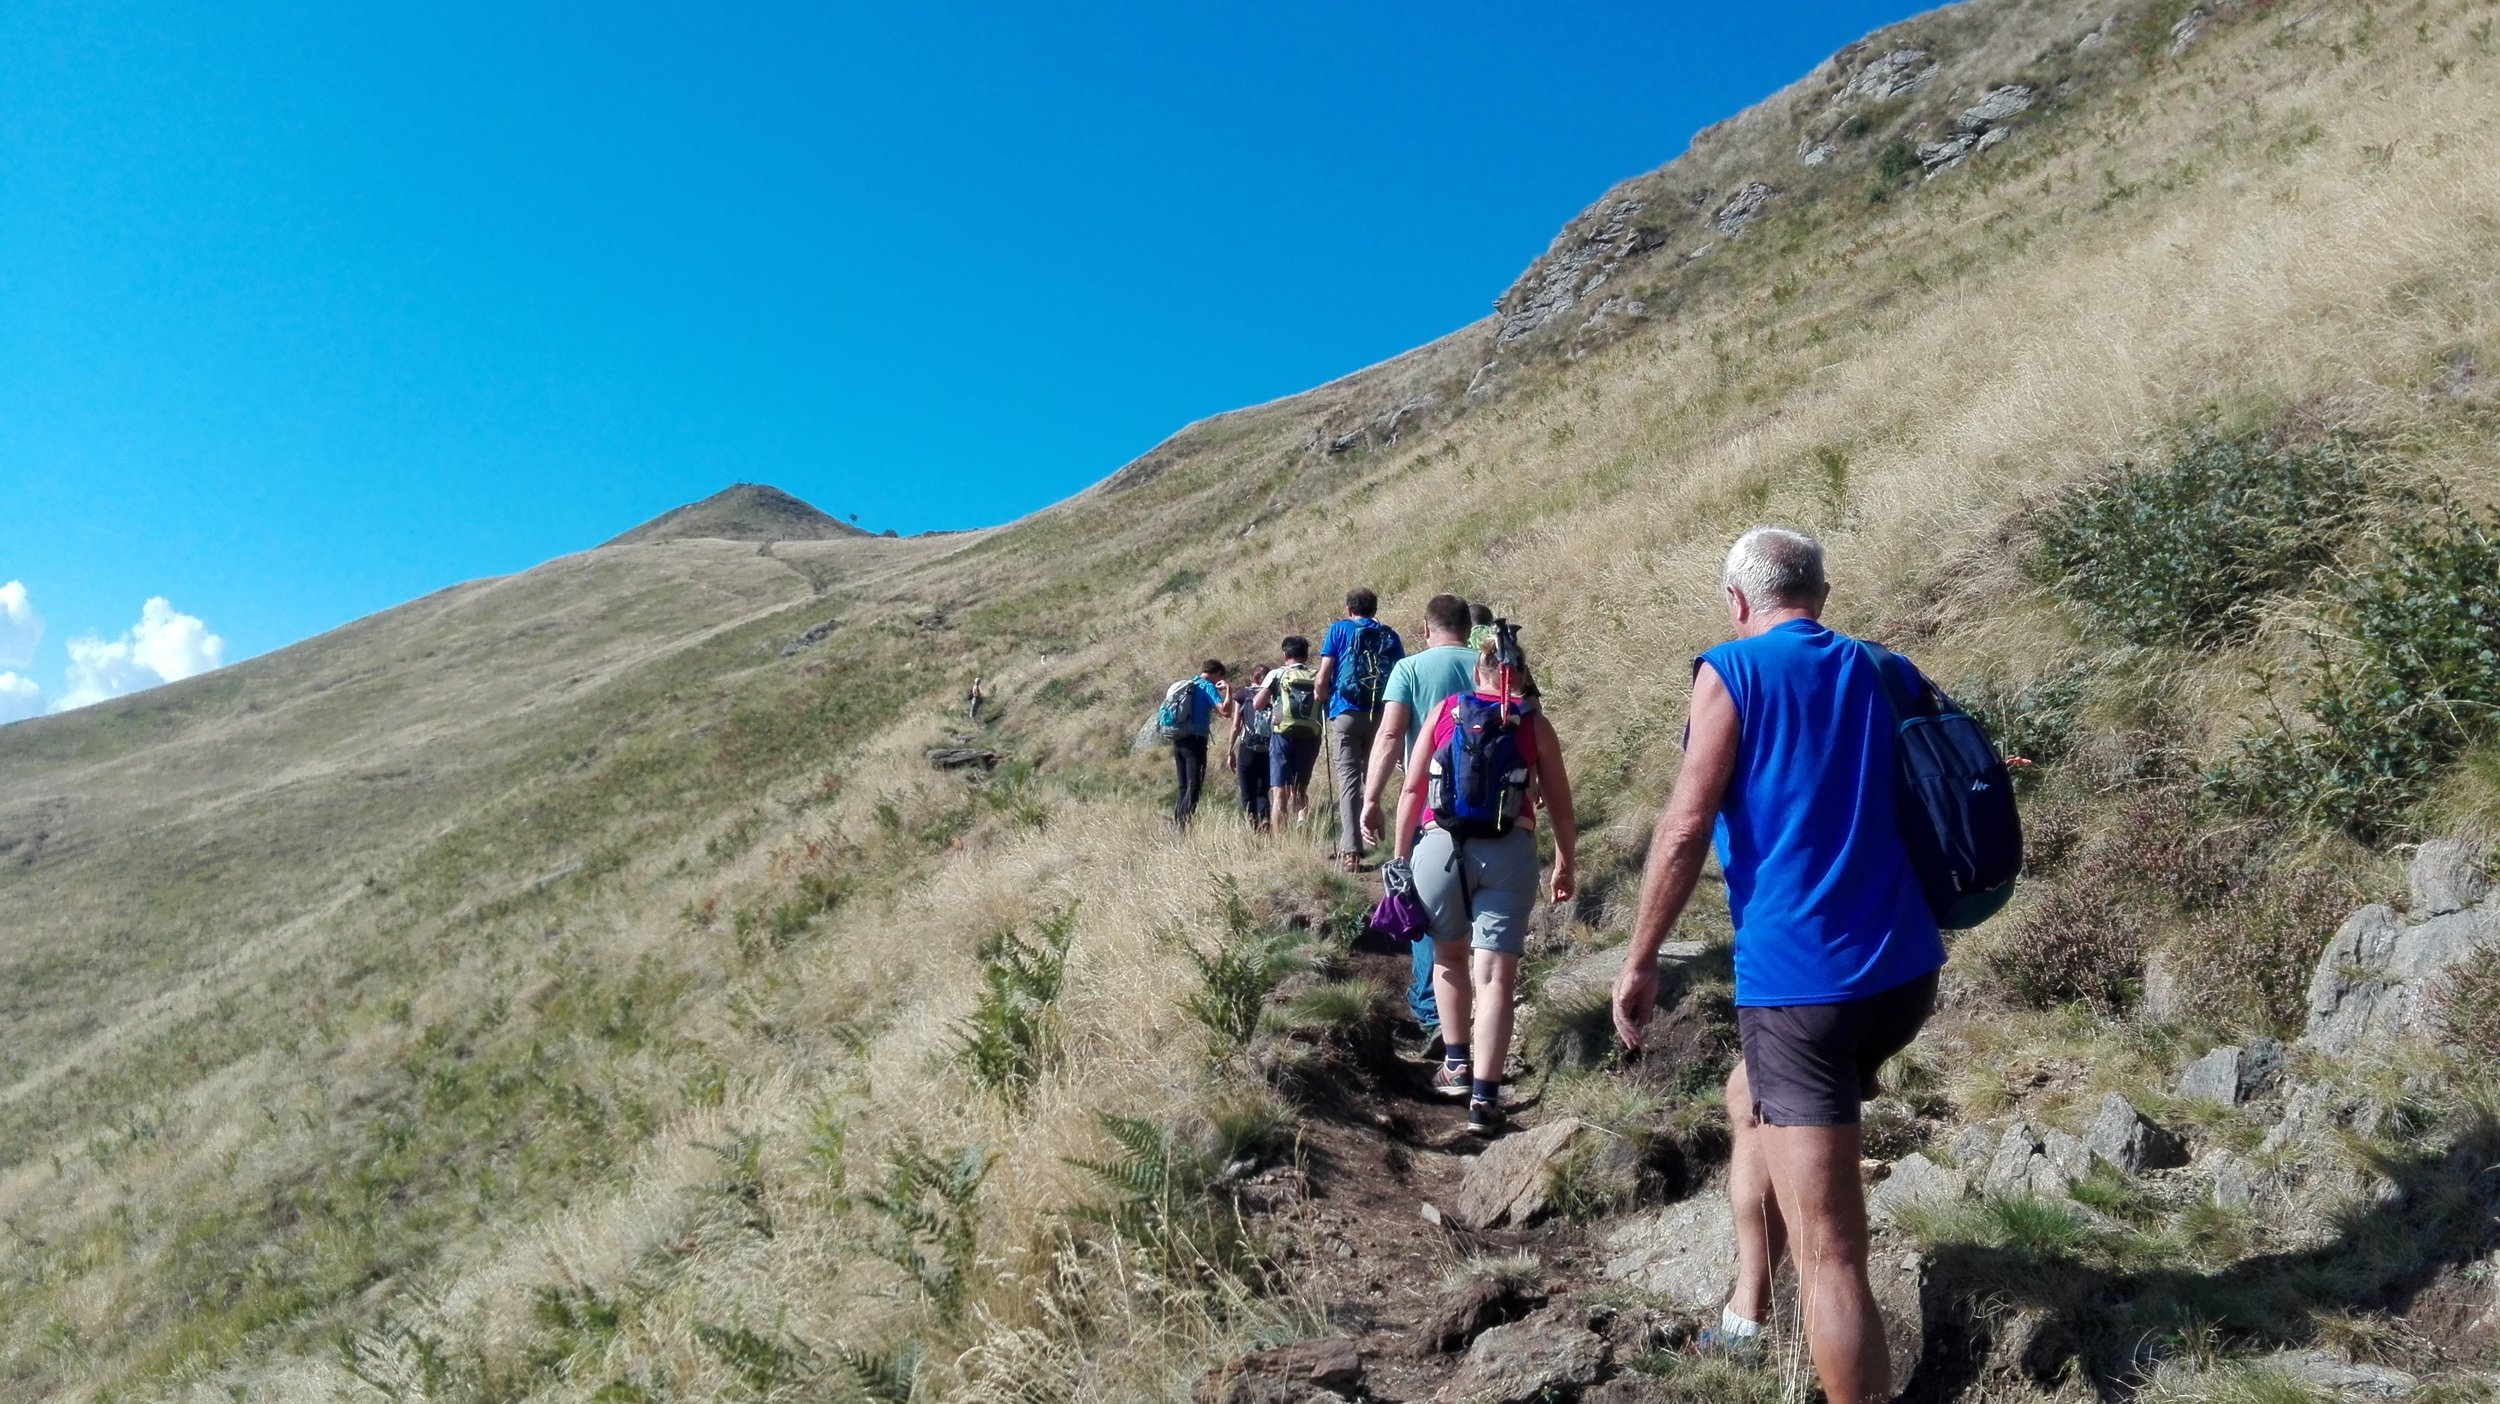 Hikingcomolake_crocedimuggio2.jpg